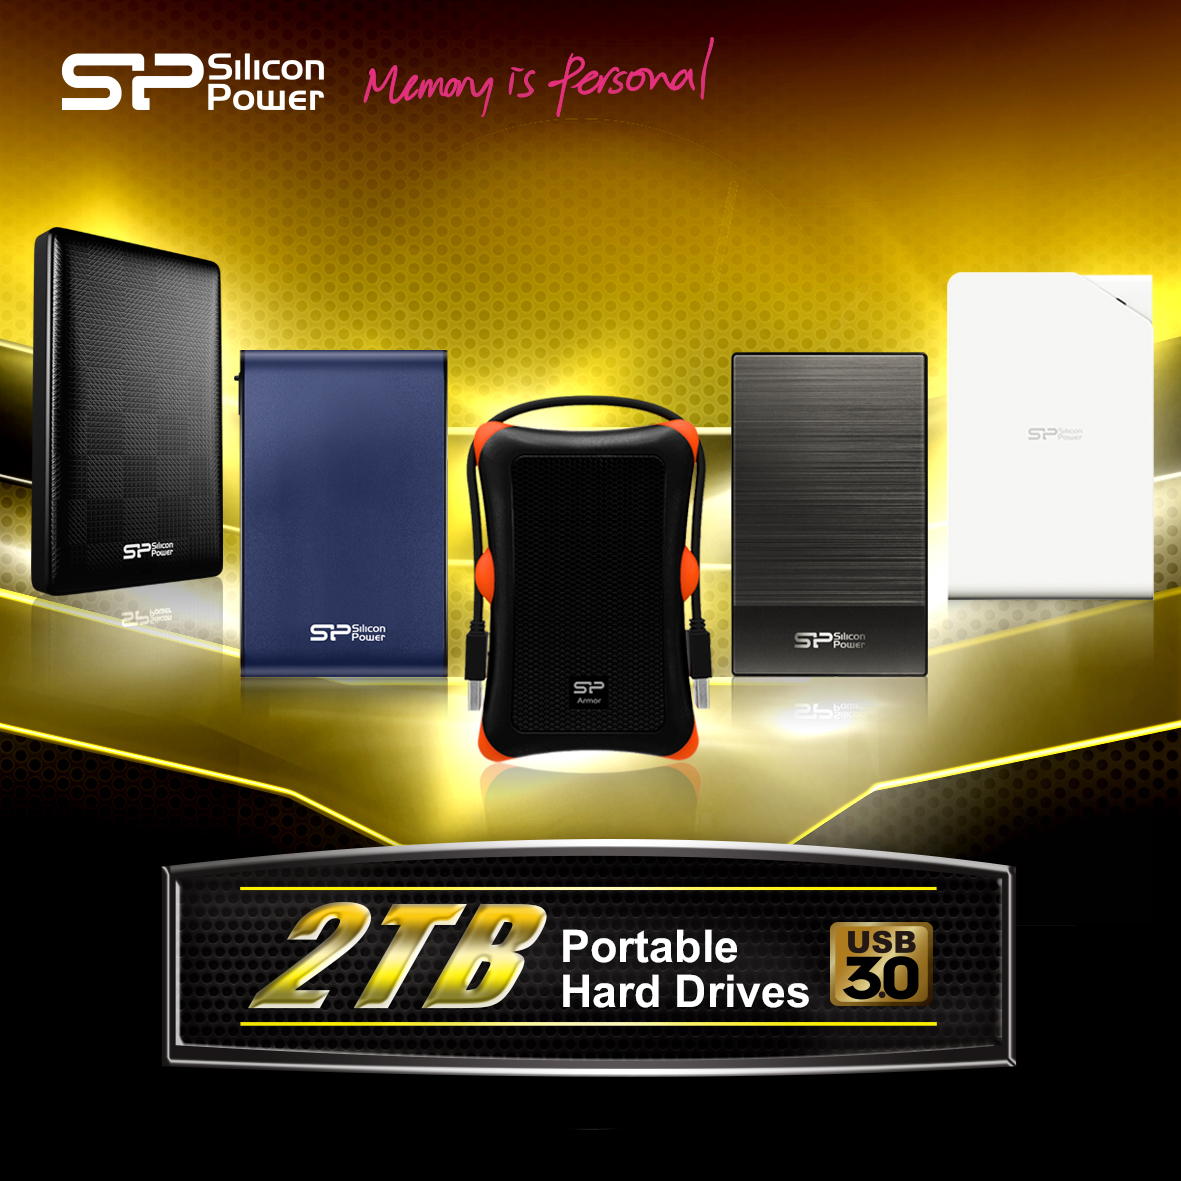 USB 3.0 Portable Hard Drives